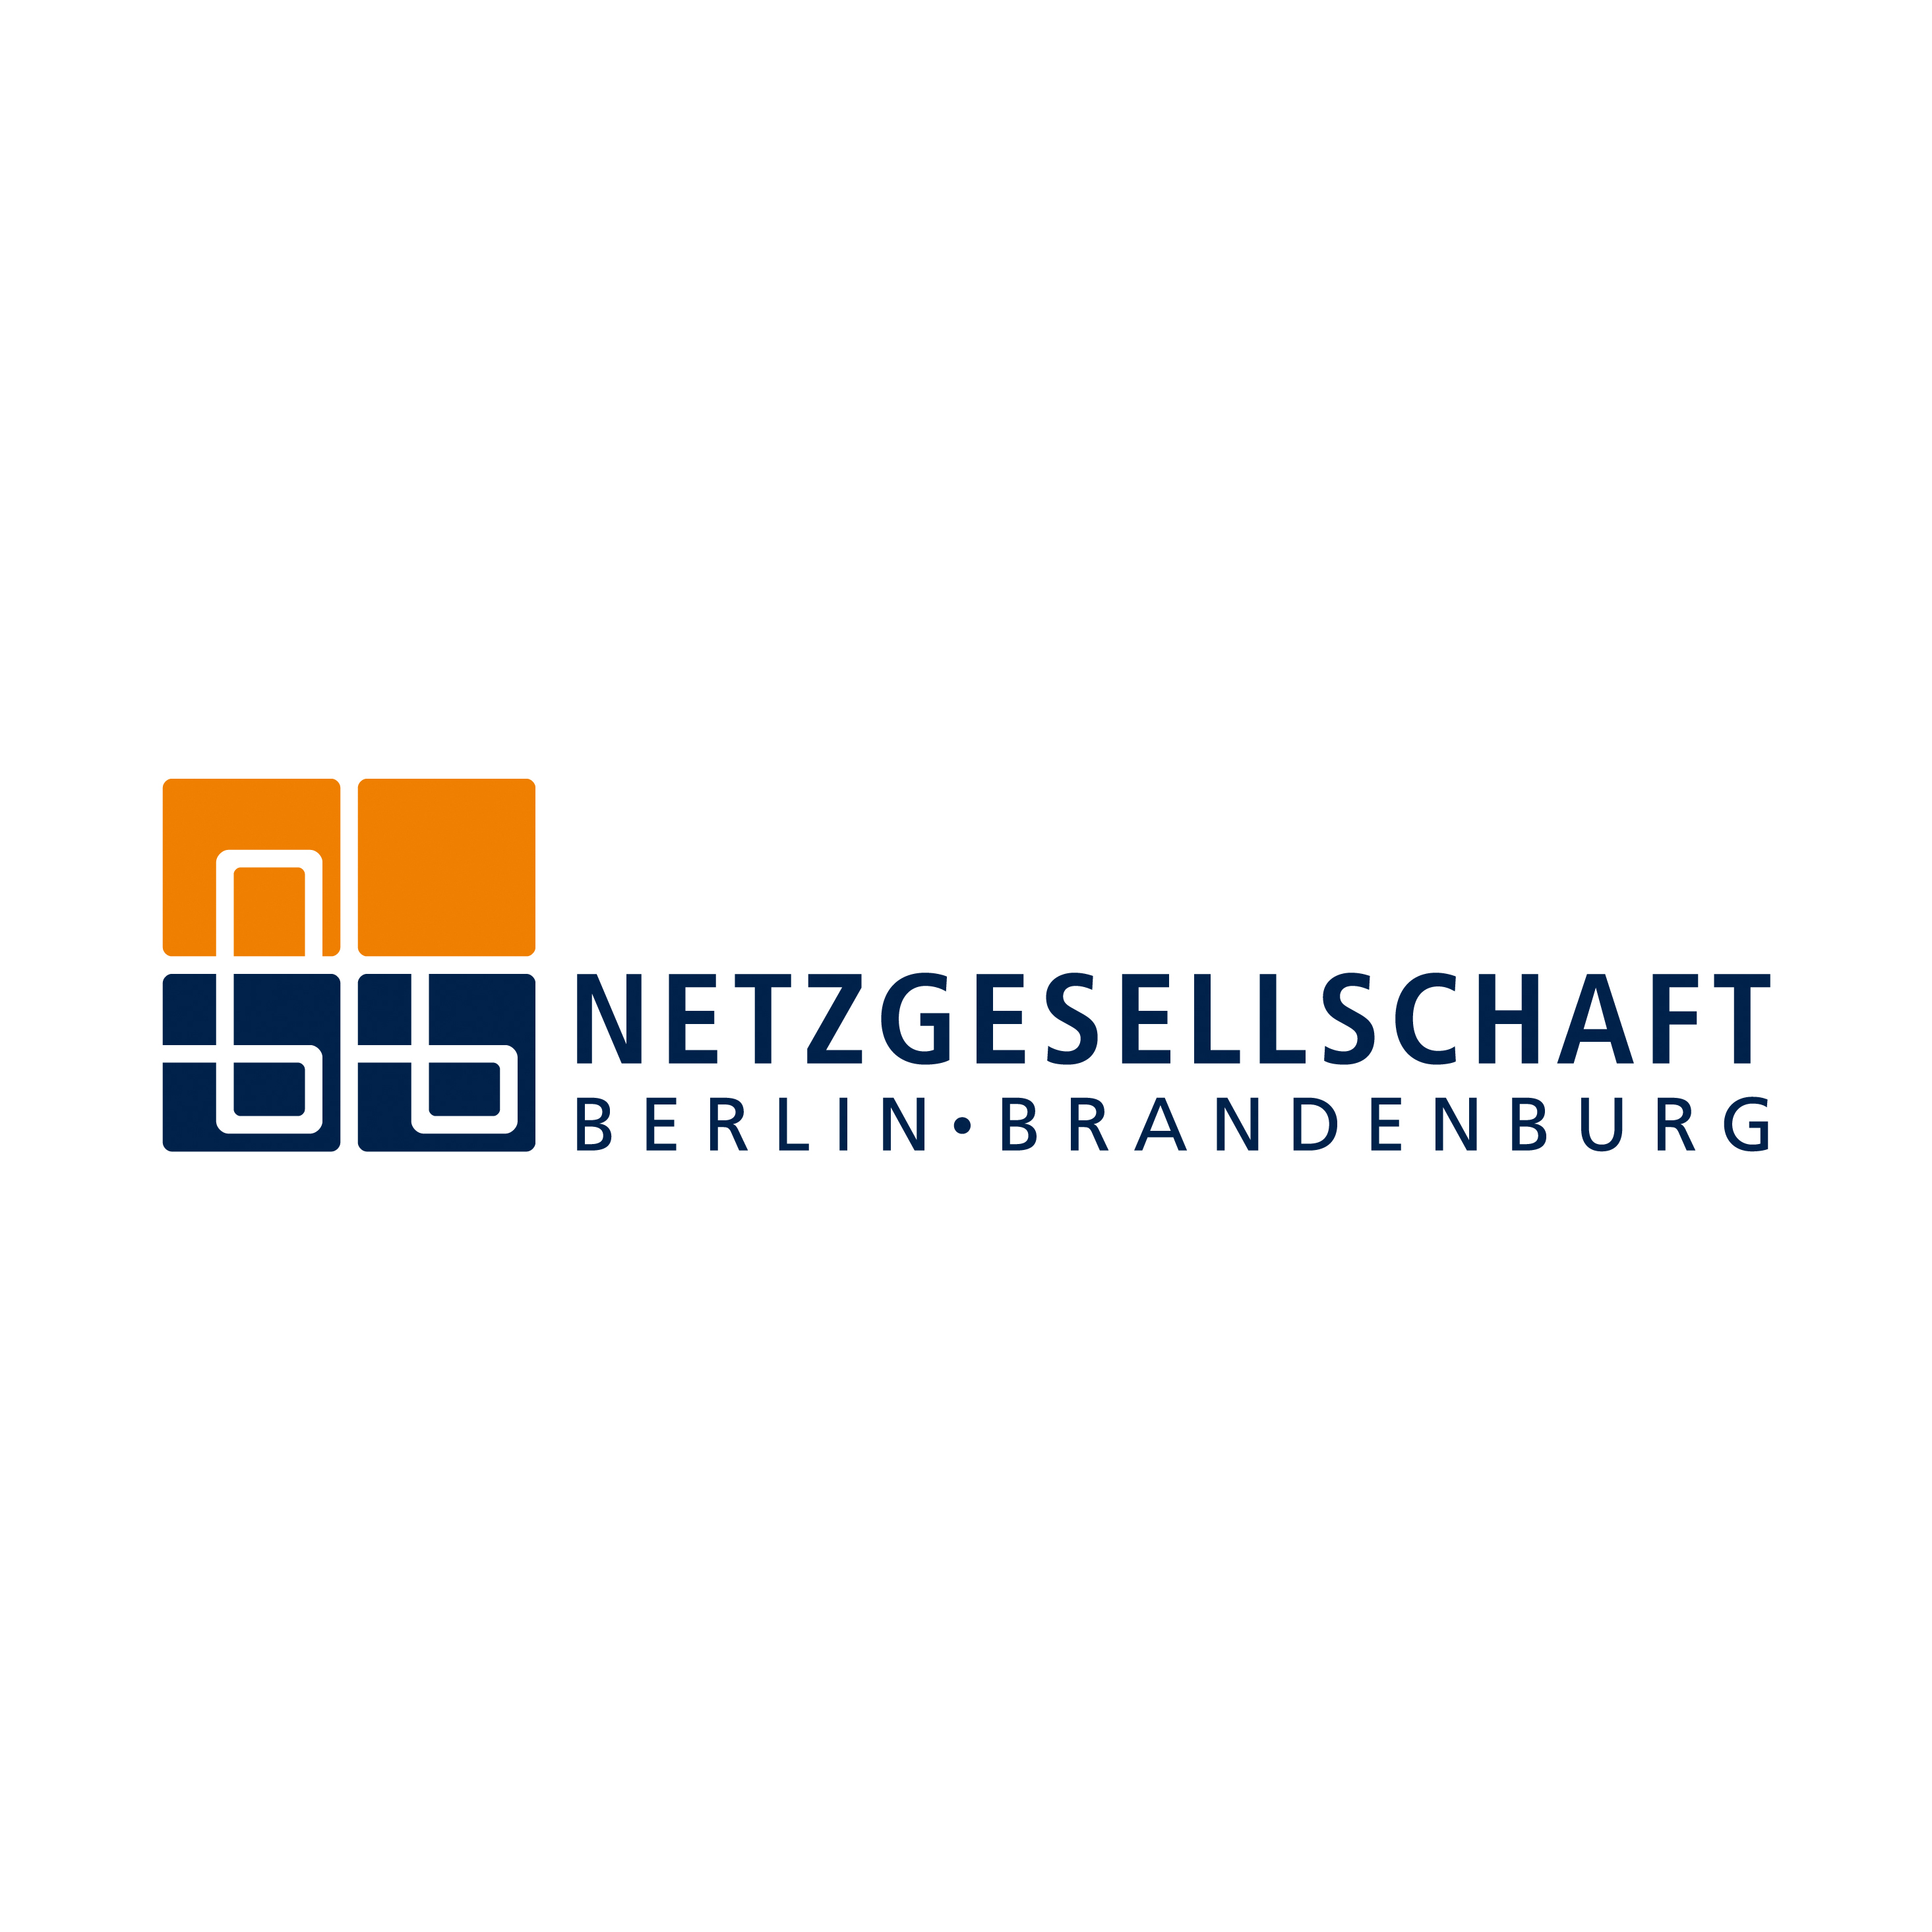 Partnerlogo NBB Netzgesellschaft Berlin-Brandenburg mbH & Co. KG